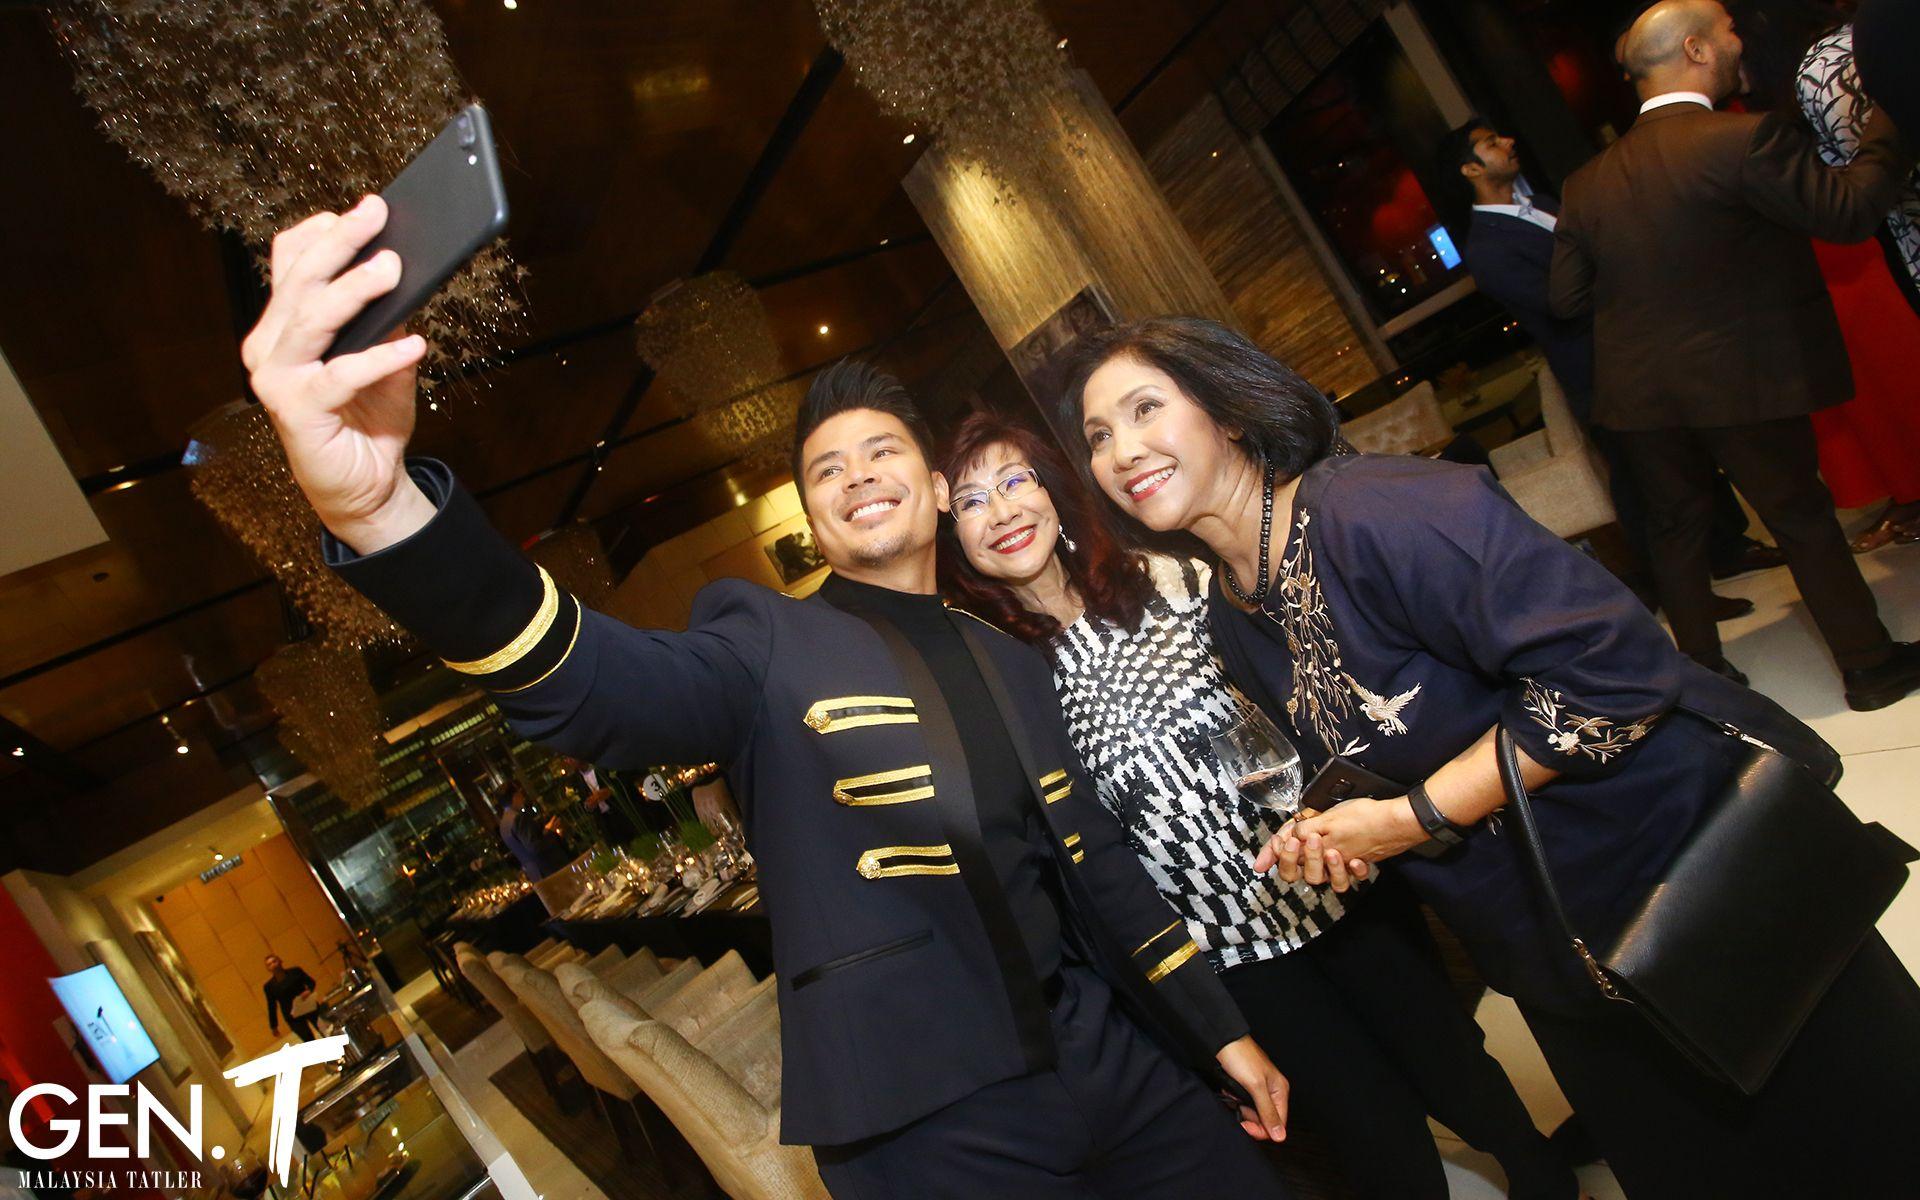 Awal Ashaari, Florence Fang and Datuk Munirah Abdul Hamid